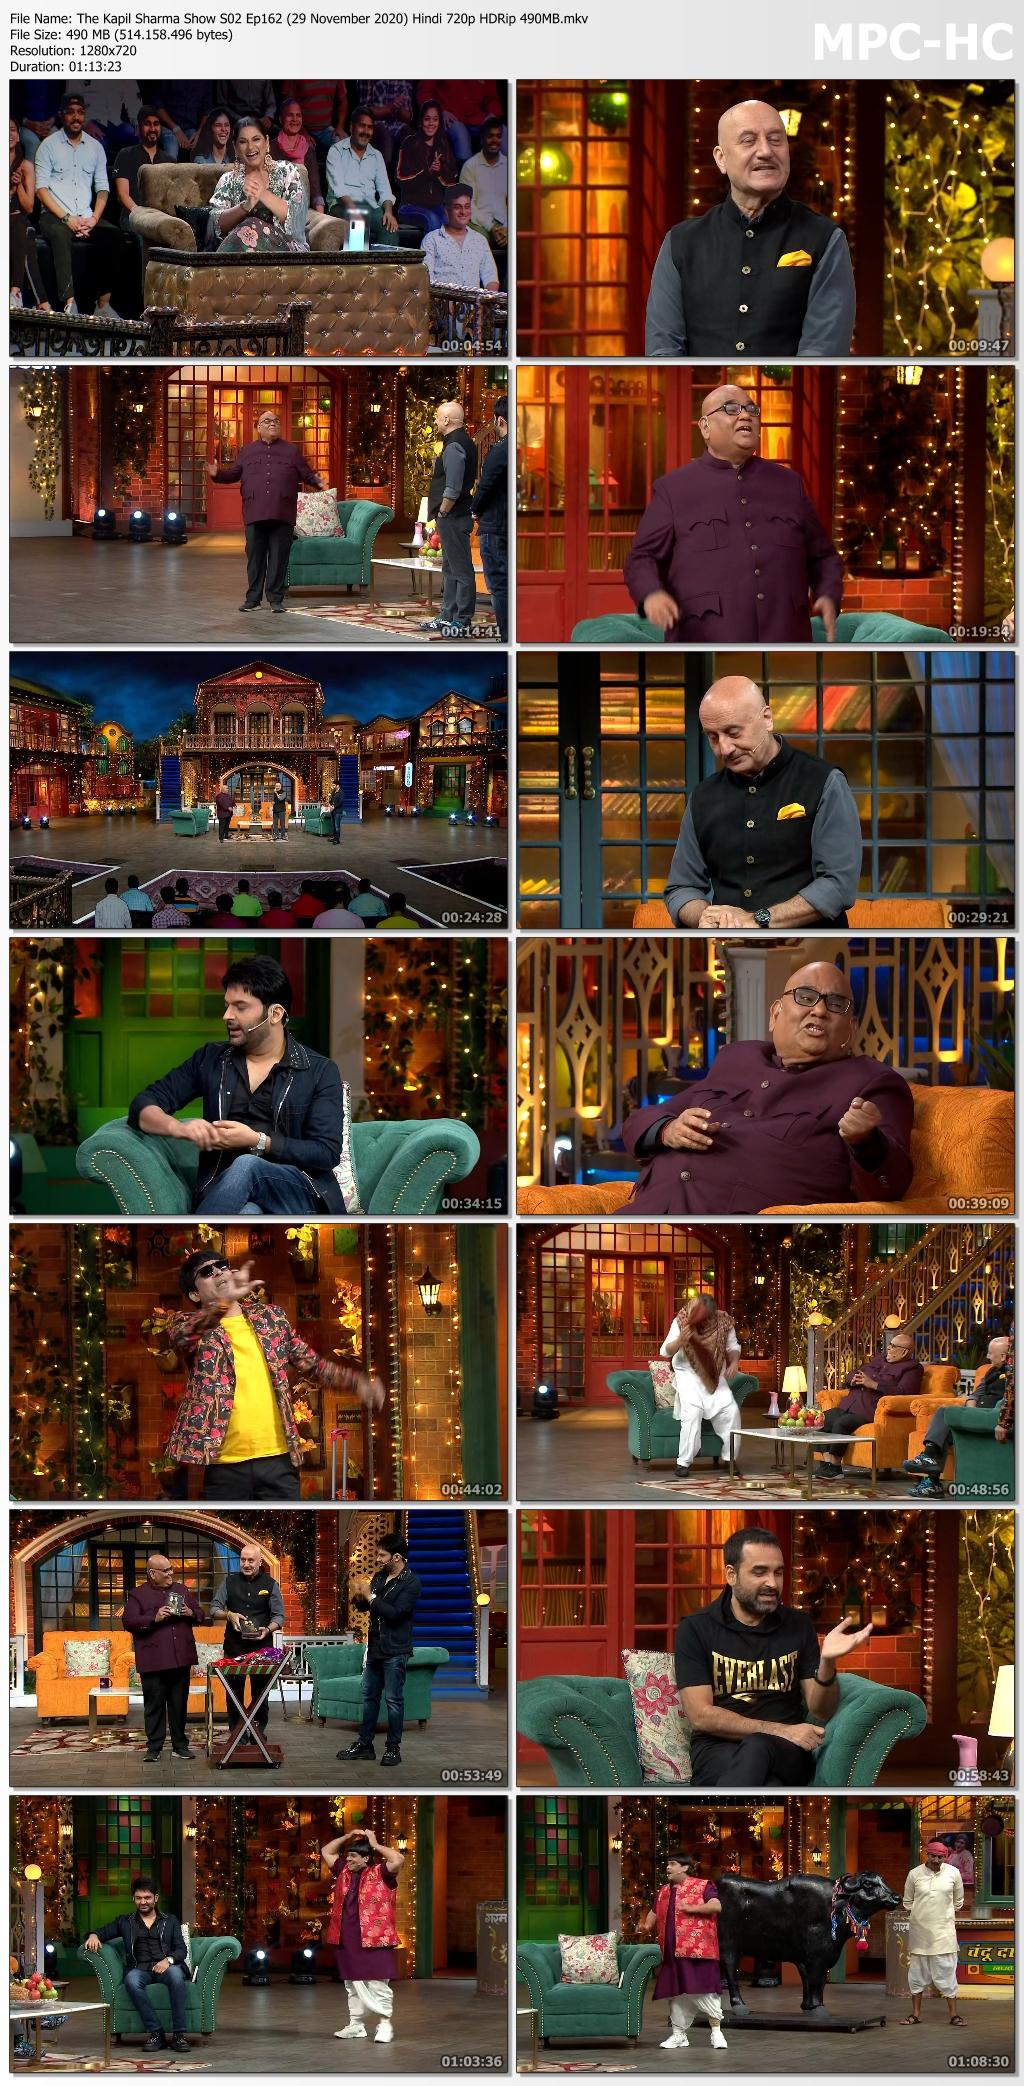 The-Kapil-Sharma-Show-S02-Ep162-29-November-2020-Hindi-720p-HDRip-490-MB-mkv-thumbs